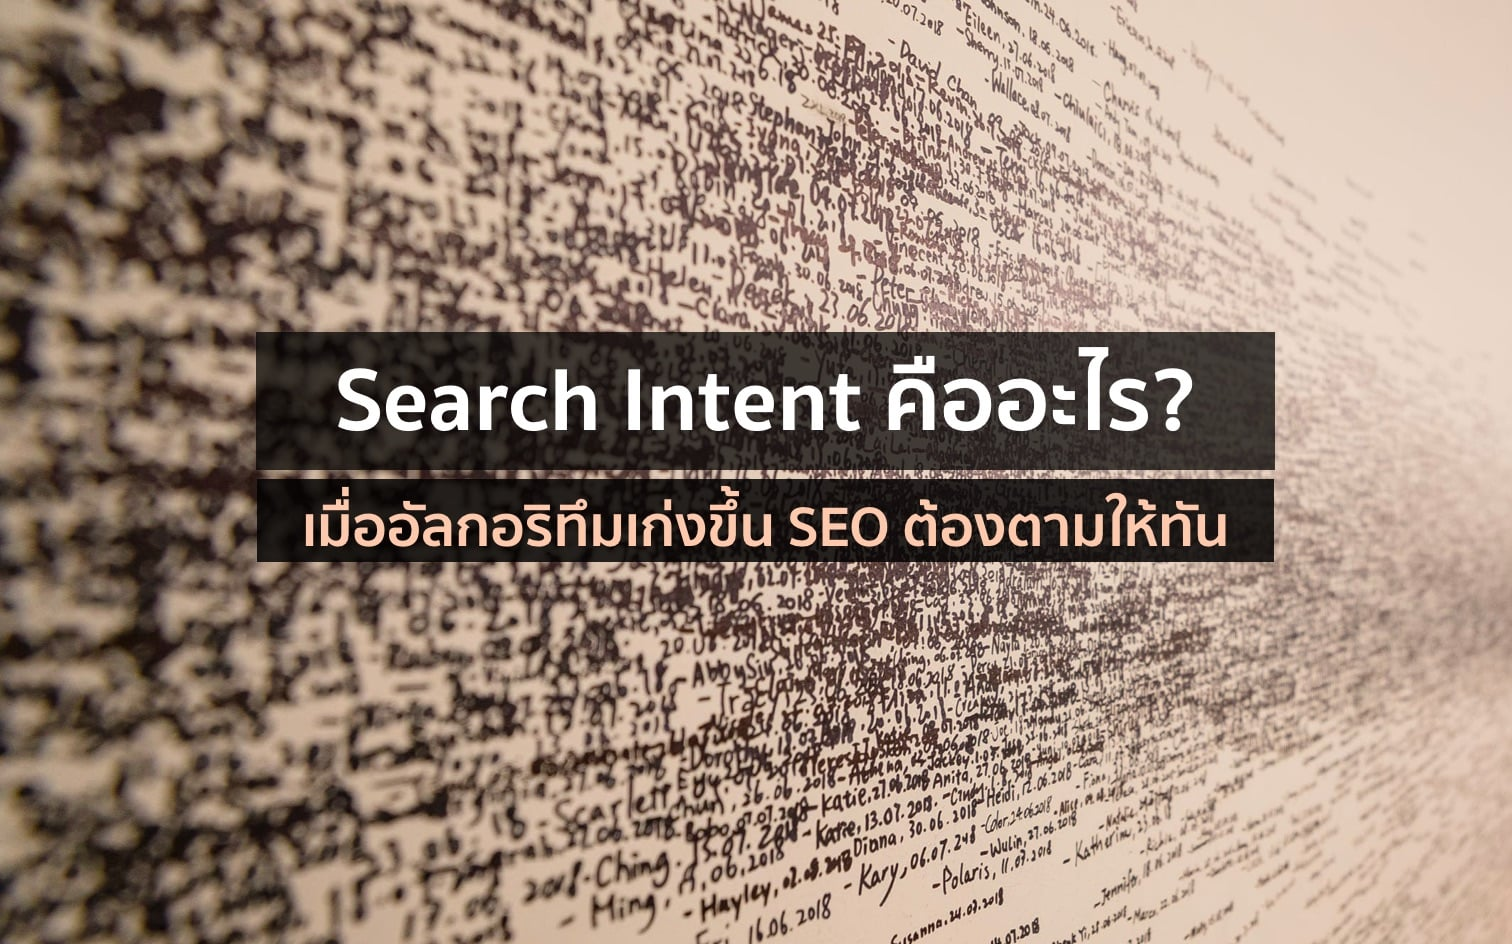 Search Intent คืออะไร? เมื่ออัลกอริทึมเก่งขึ้น SEO ต้องตามให้ทัน